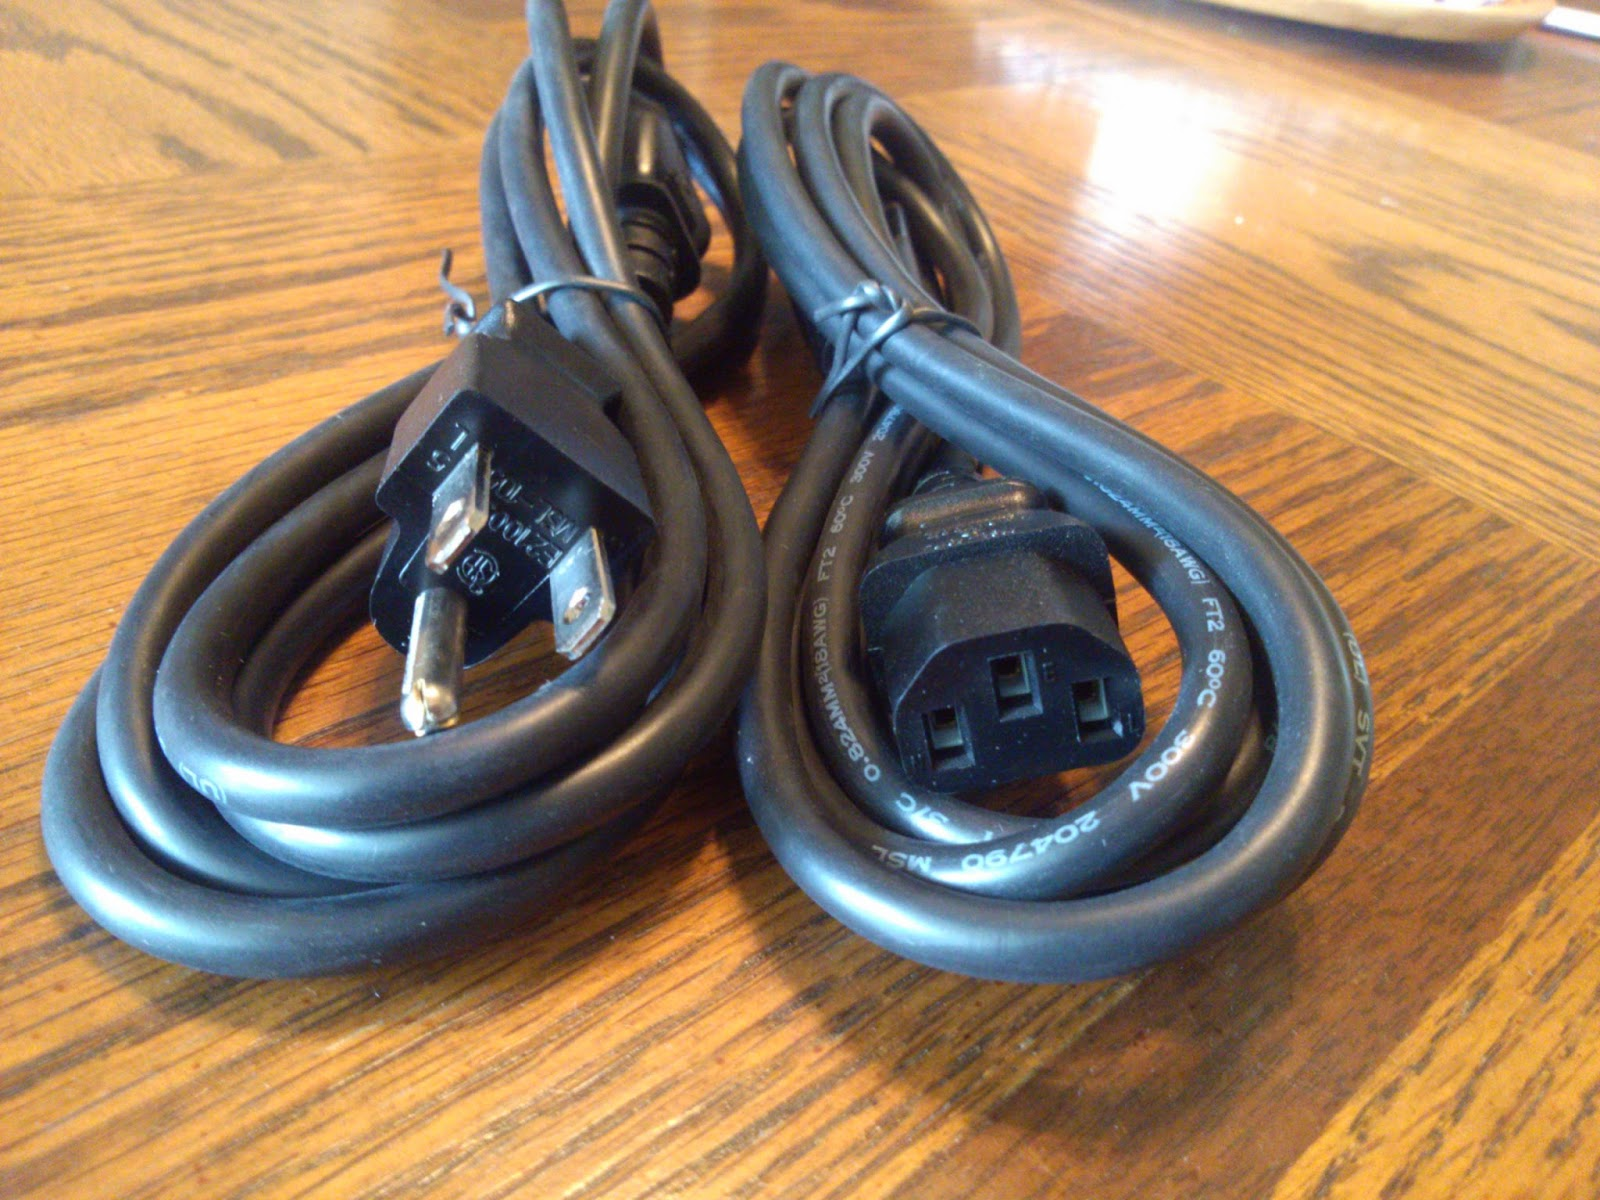 Premium 6-foot Universal Power Cord Review